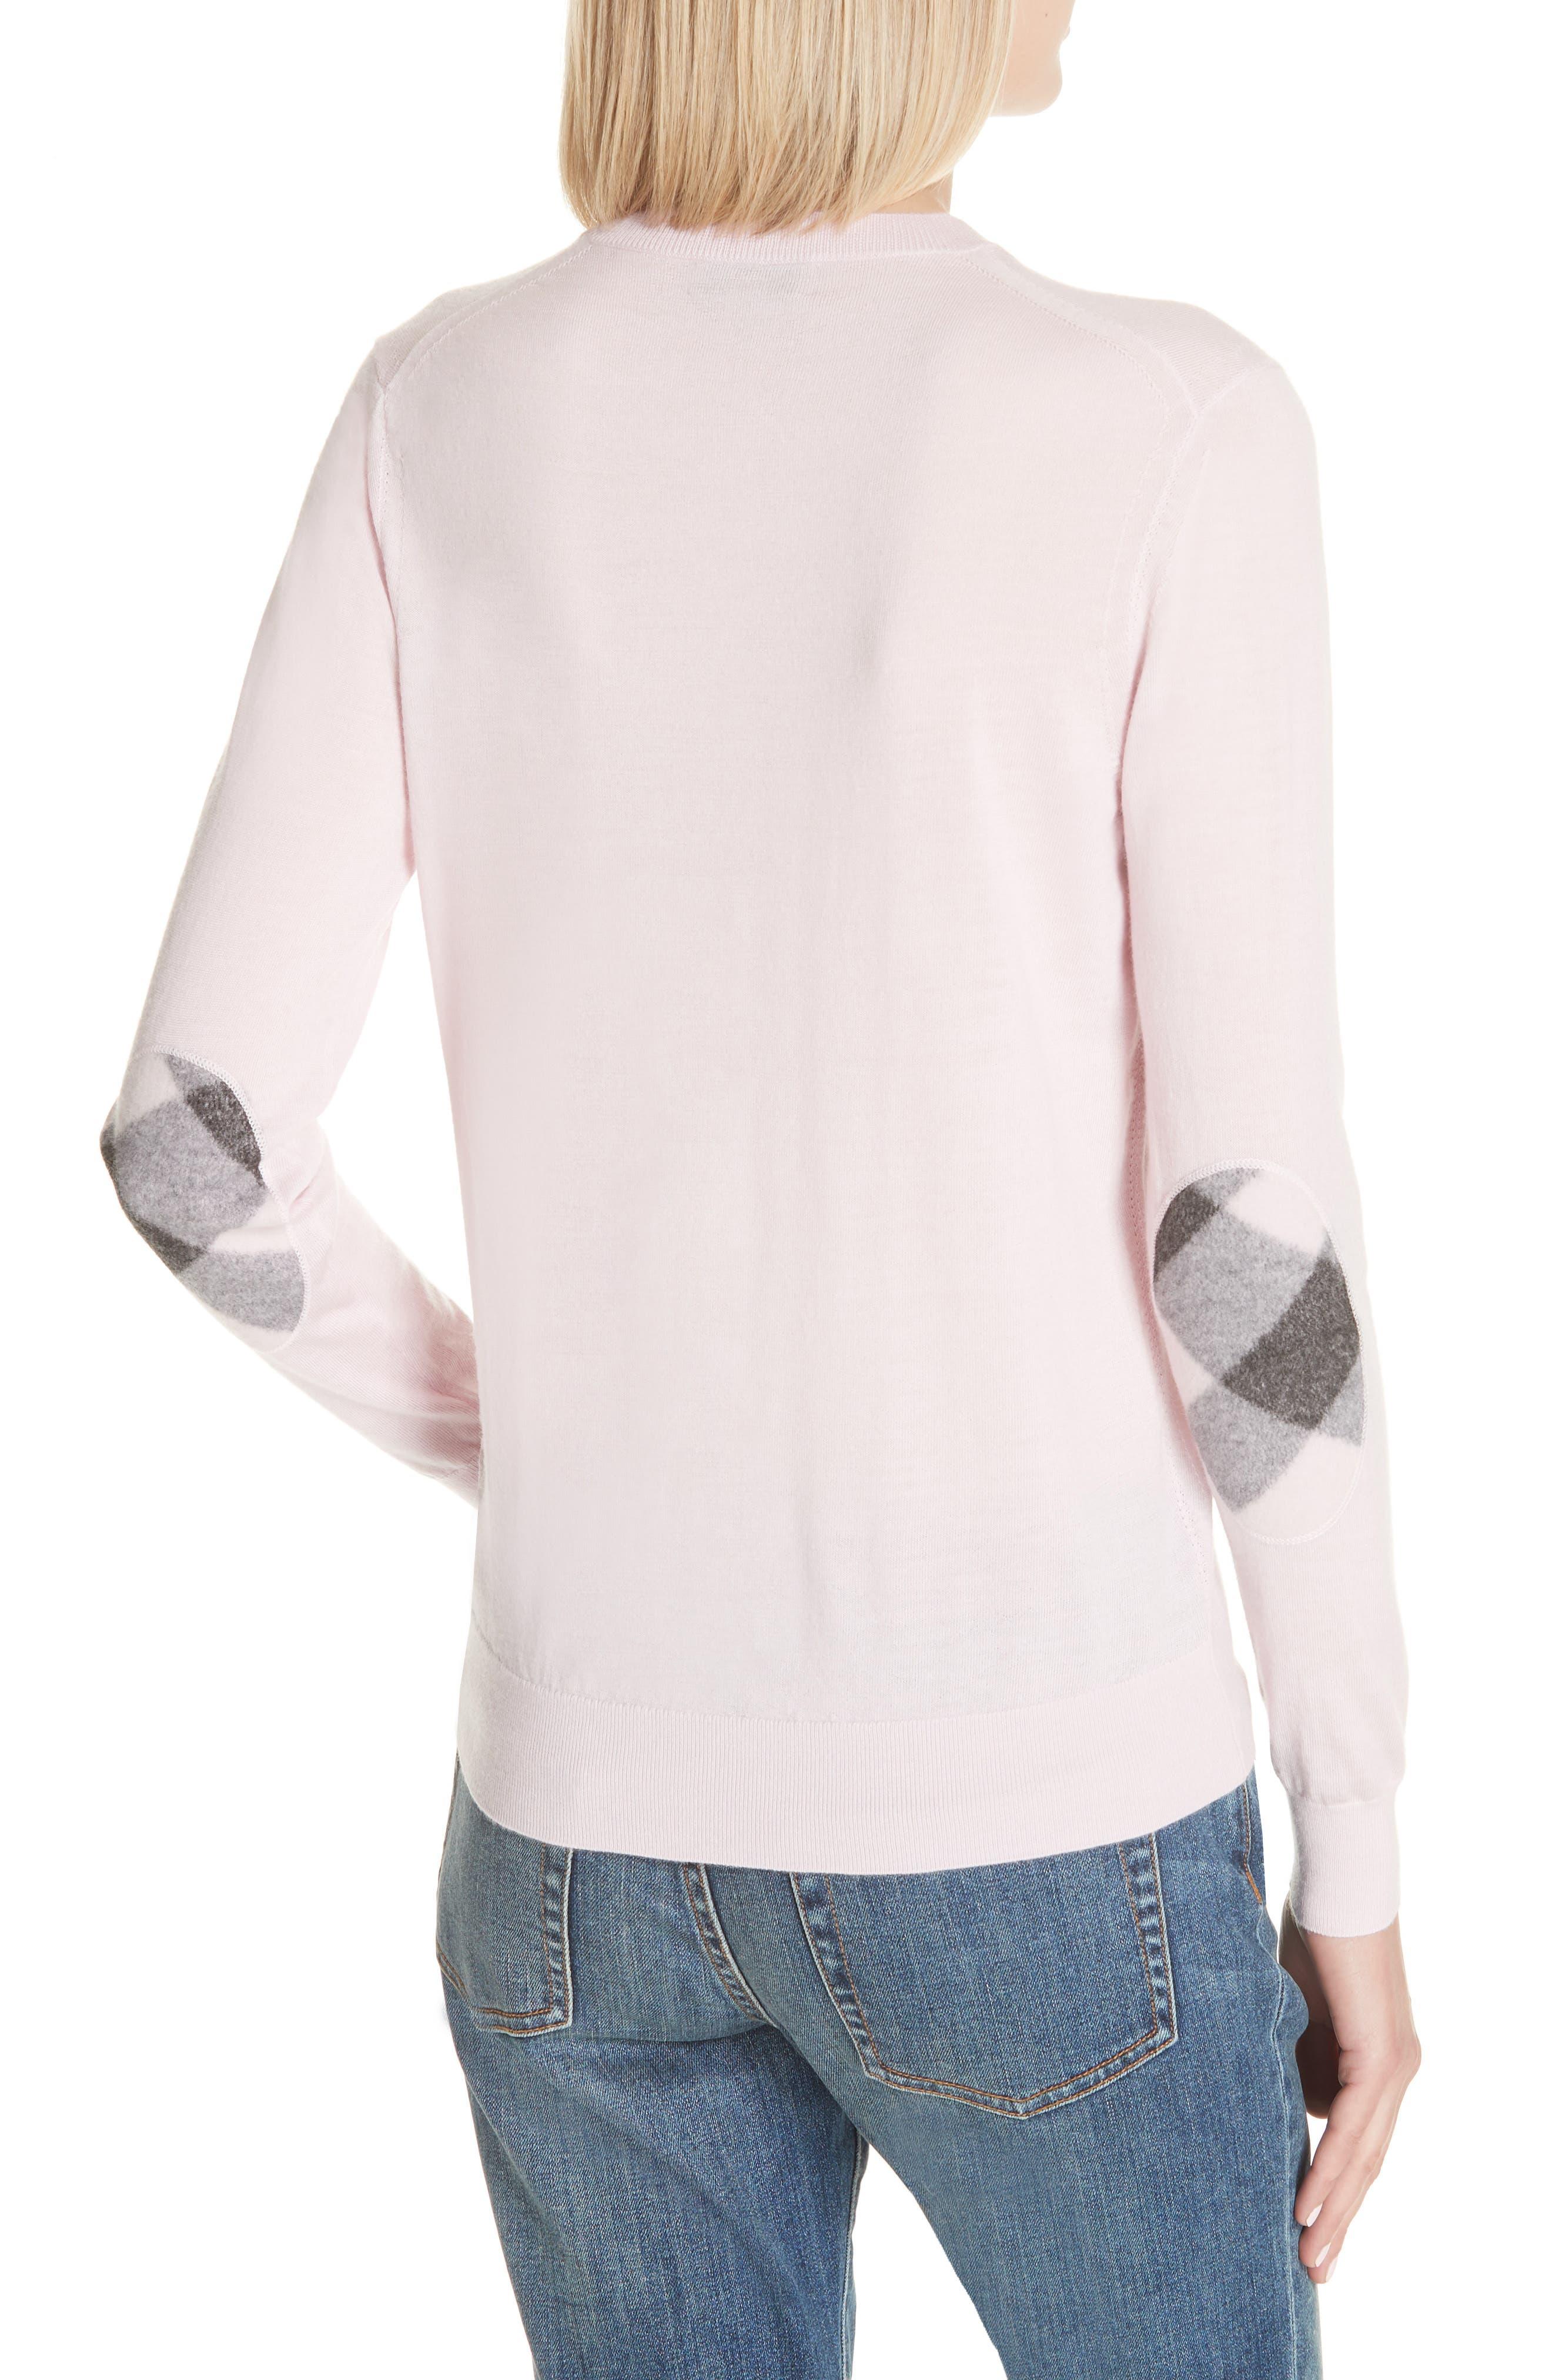 Viar Merino Wool Sweater,                             Alternate thumbnail 23, color,